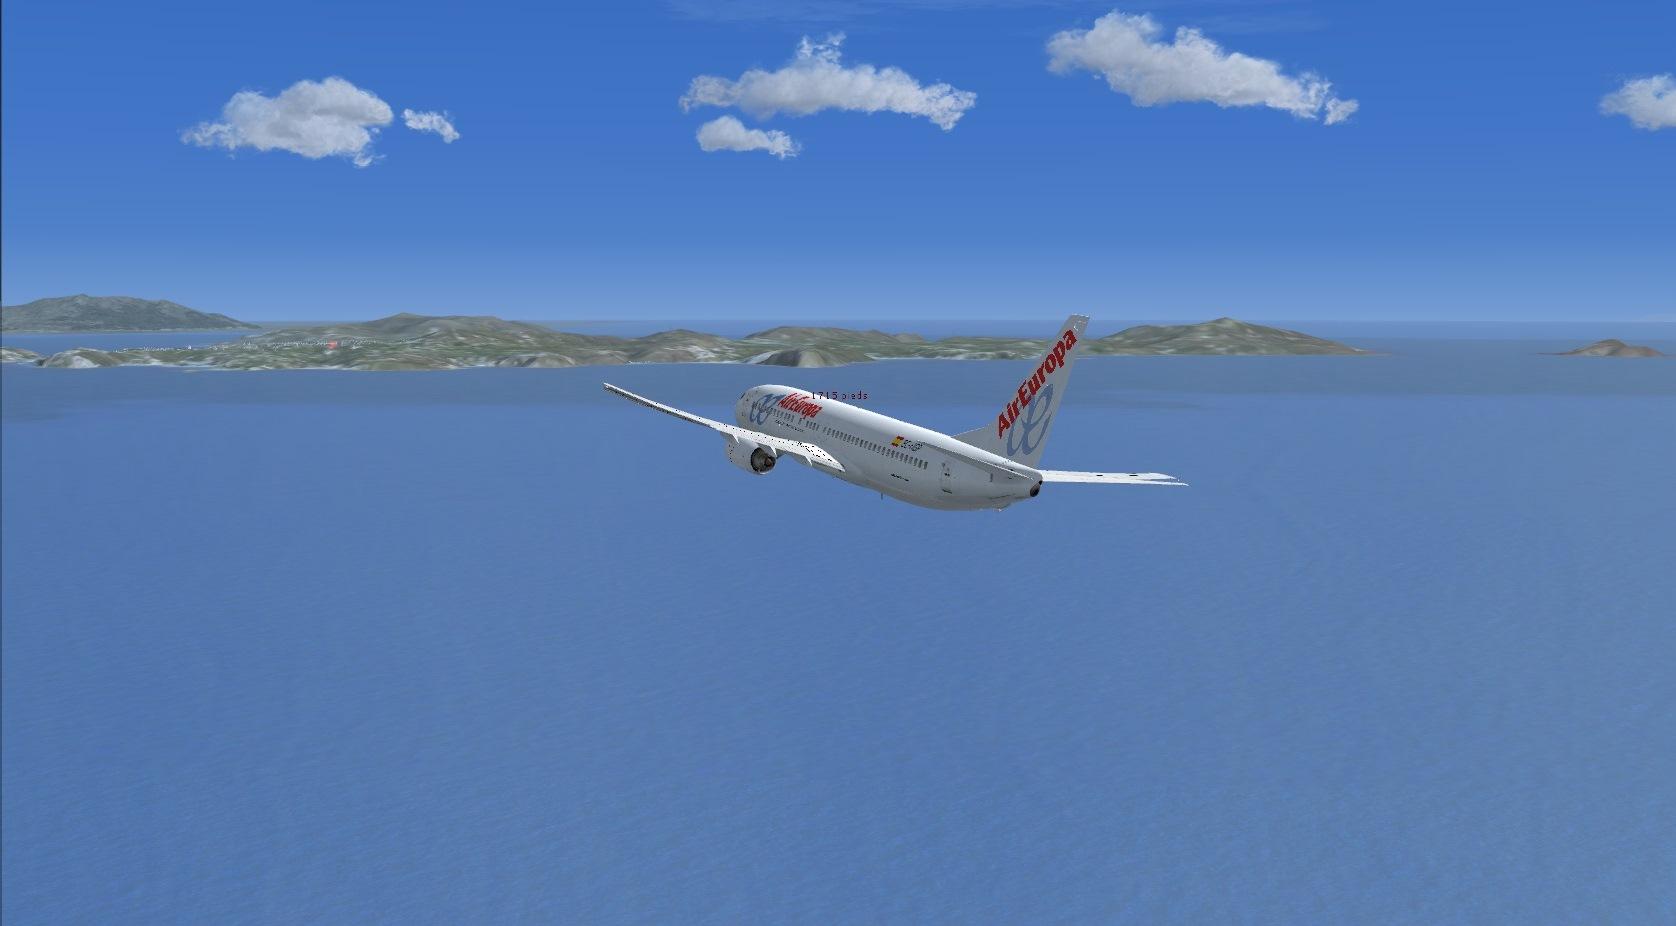 First landing Mykonos 8840930869_26ea9ba253_o